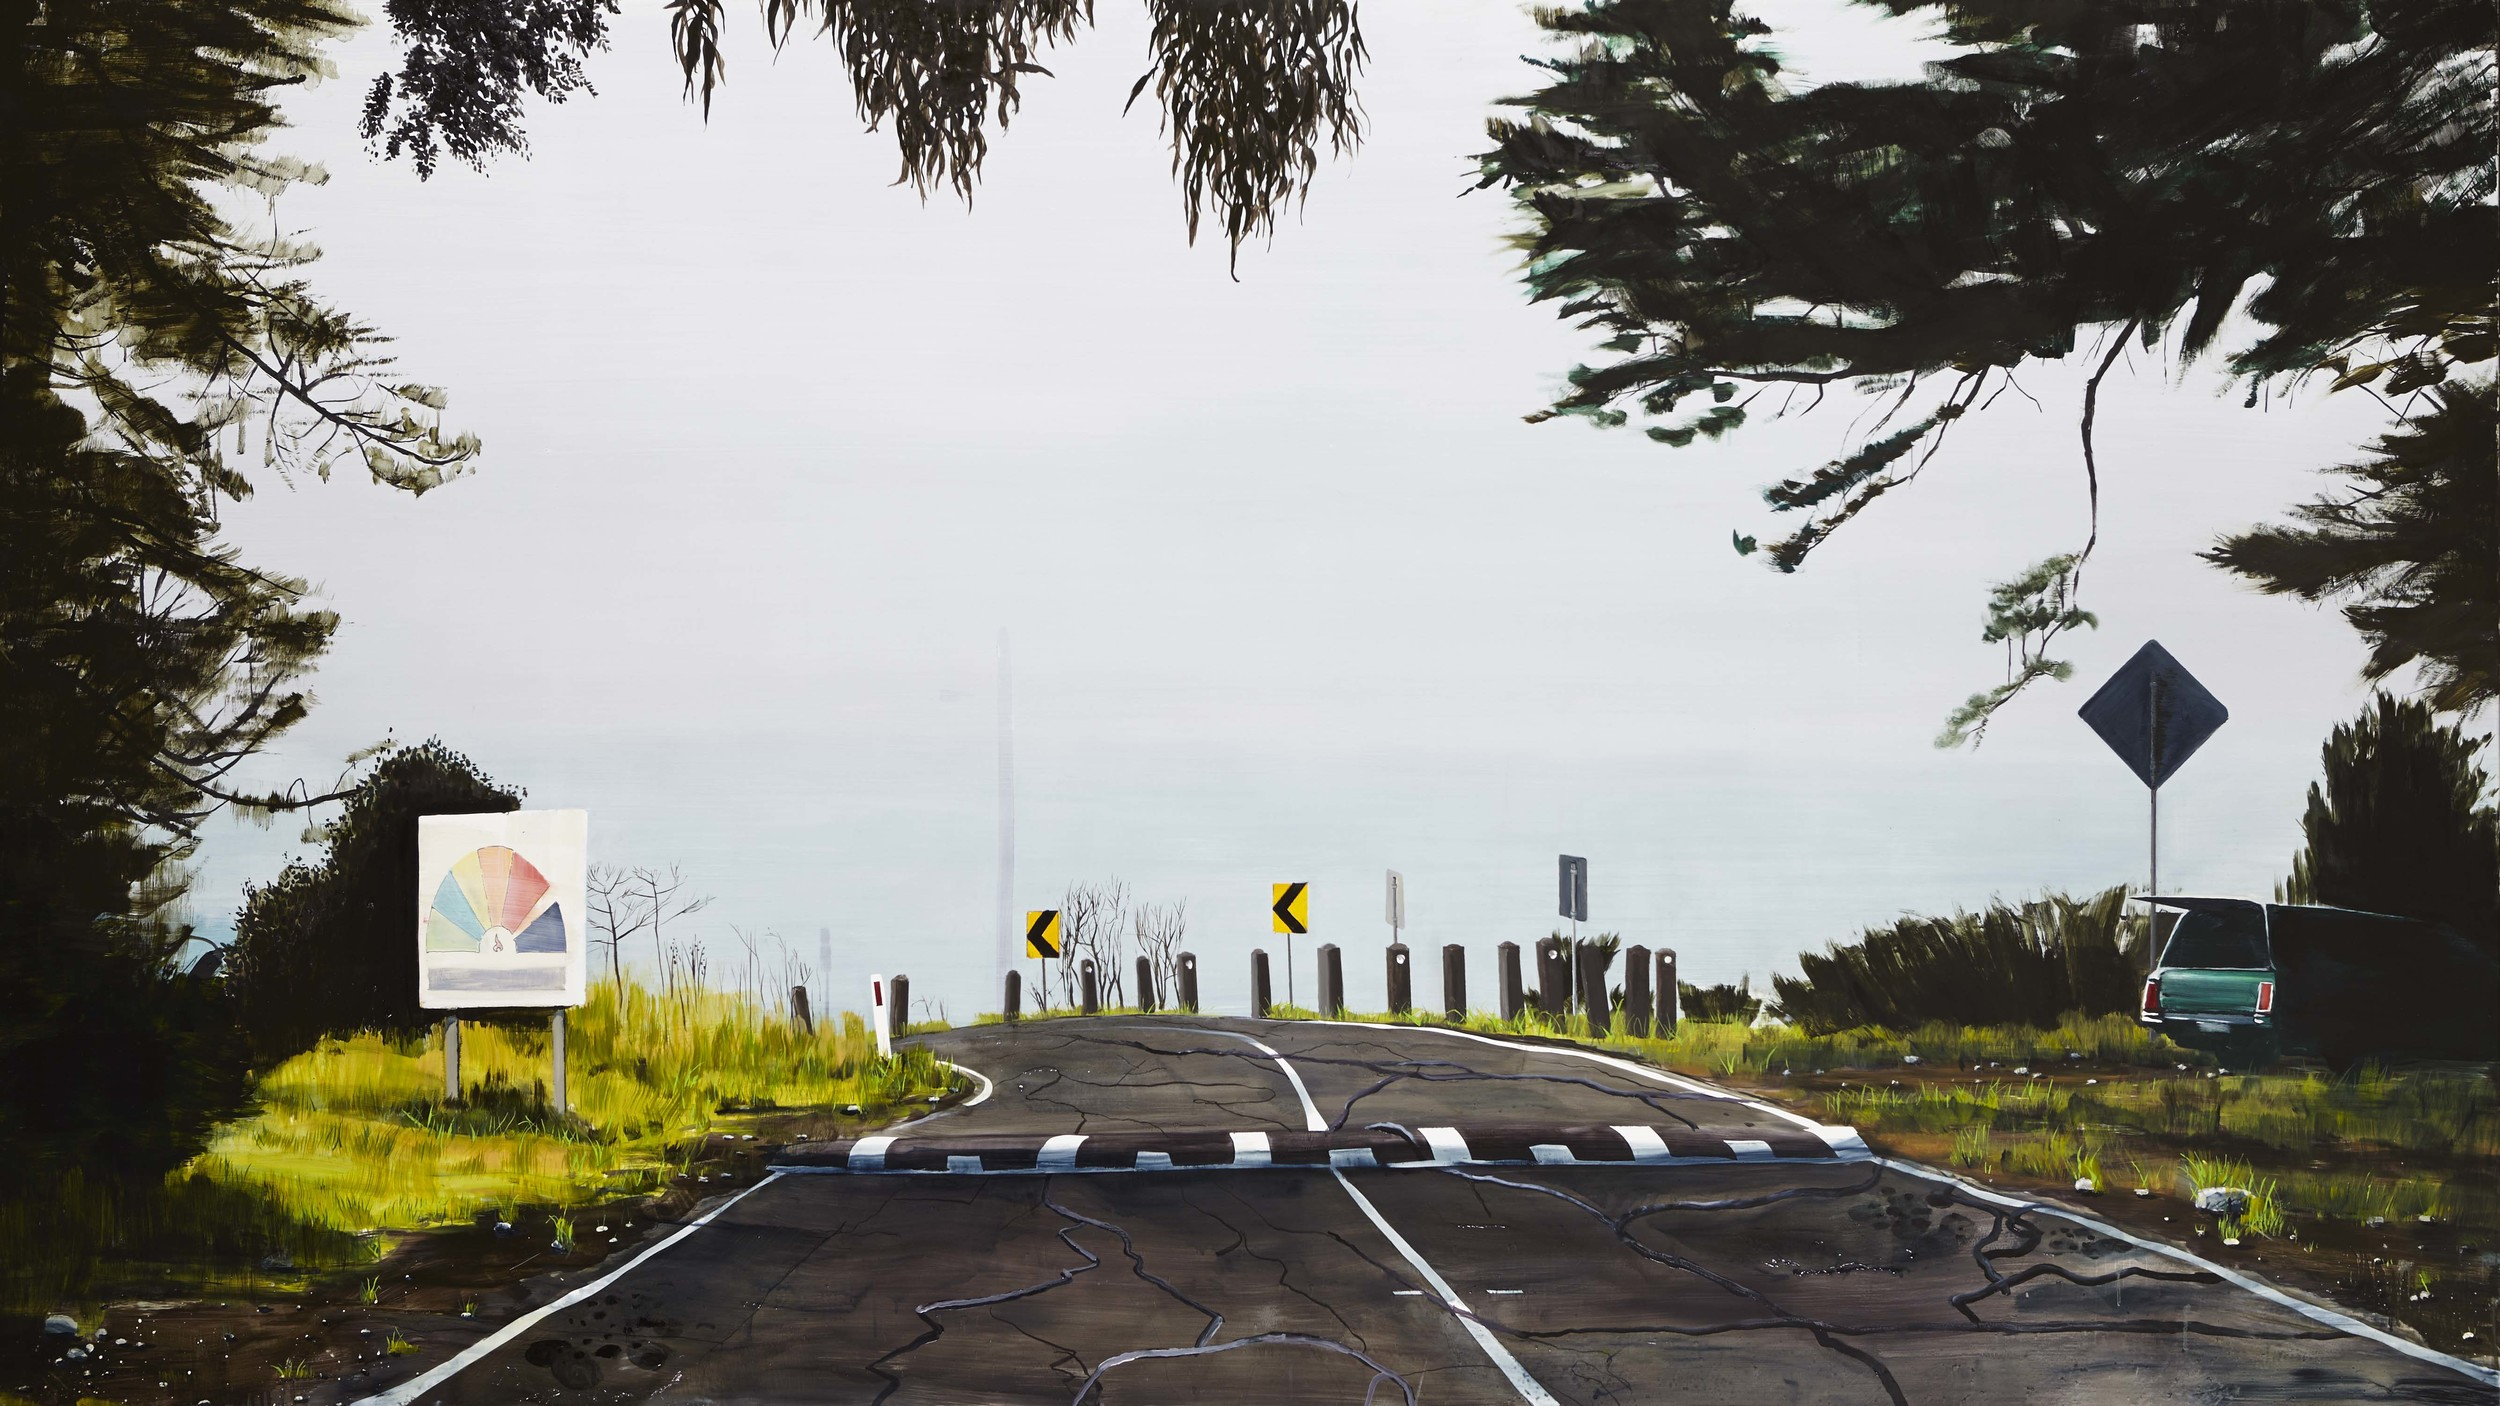 Byrne's road,  2013 Acrylic, oil and automotive enamel on linen 120 x 260cm